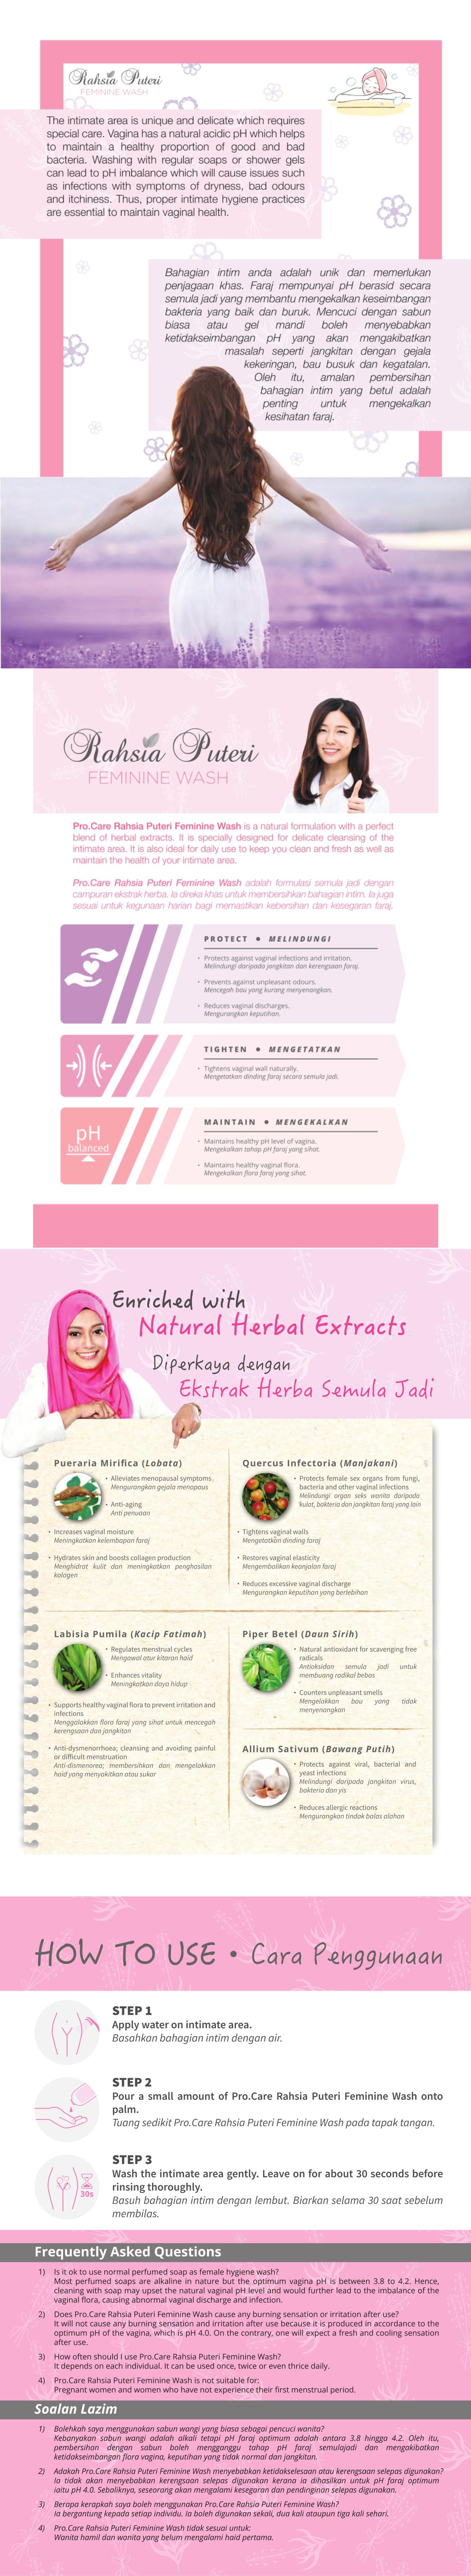 Rahsia Puteri Infographic